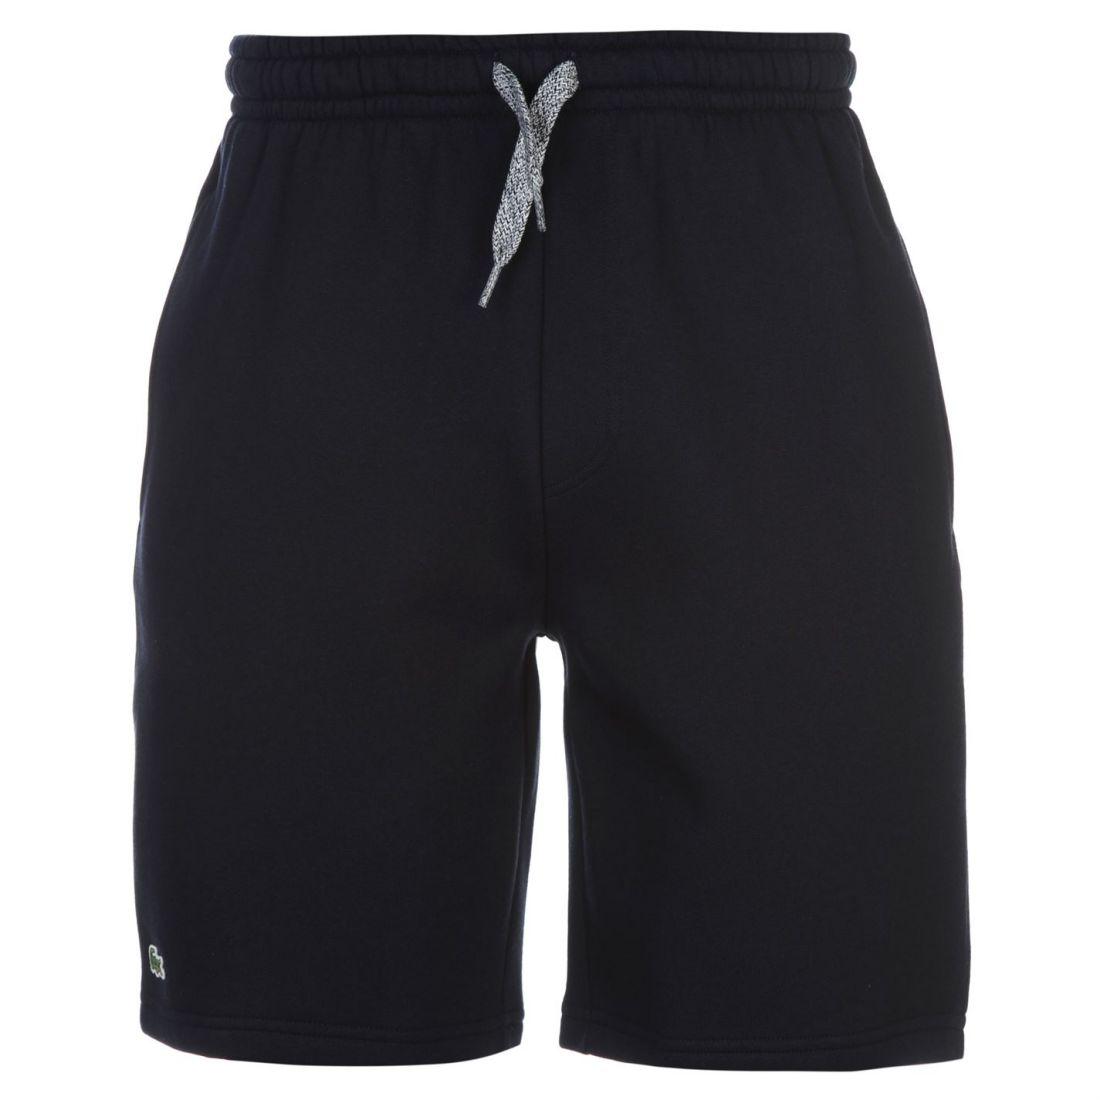 Lacoste-Fleece-Jogger-Shorts-Mens thumbnail 3